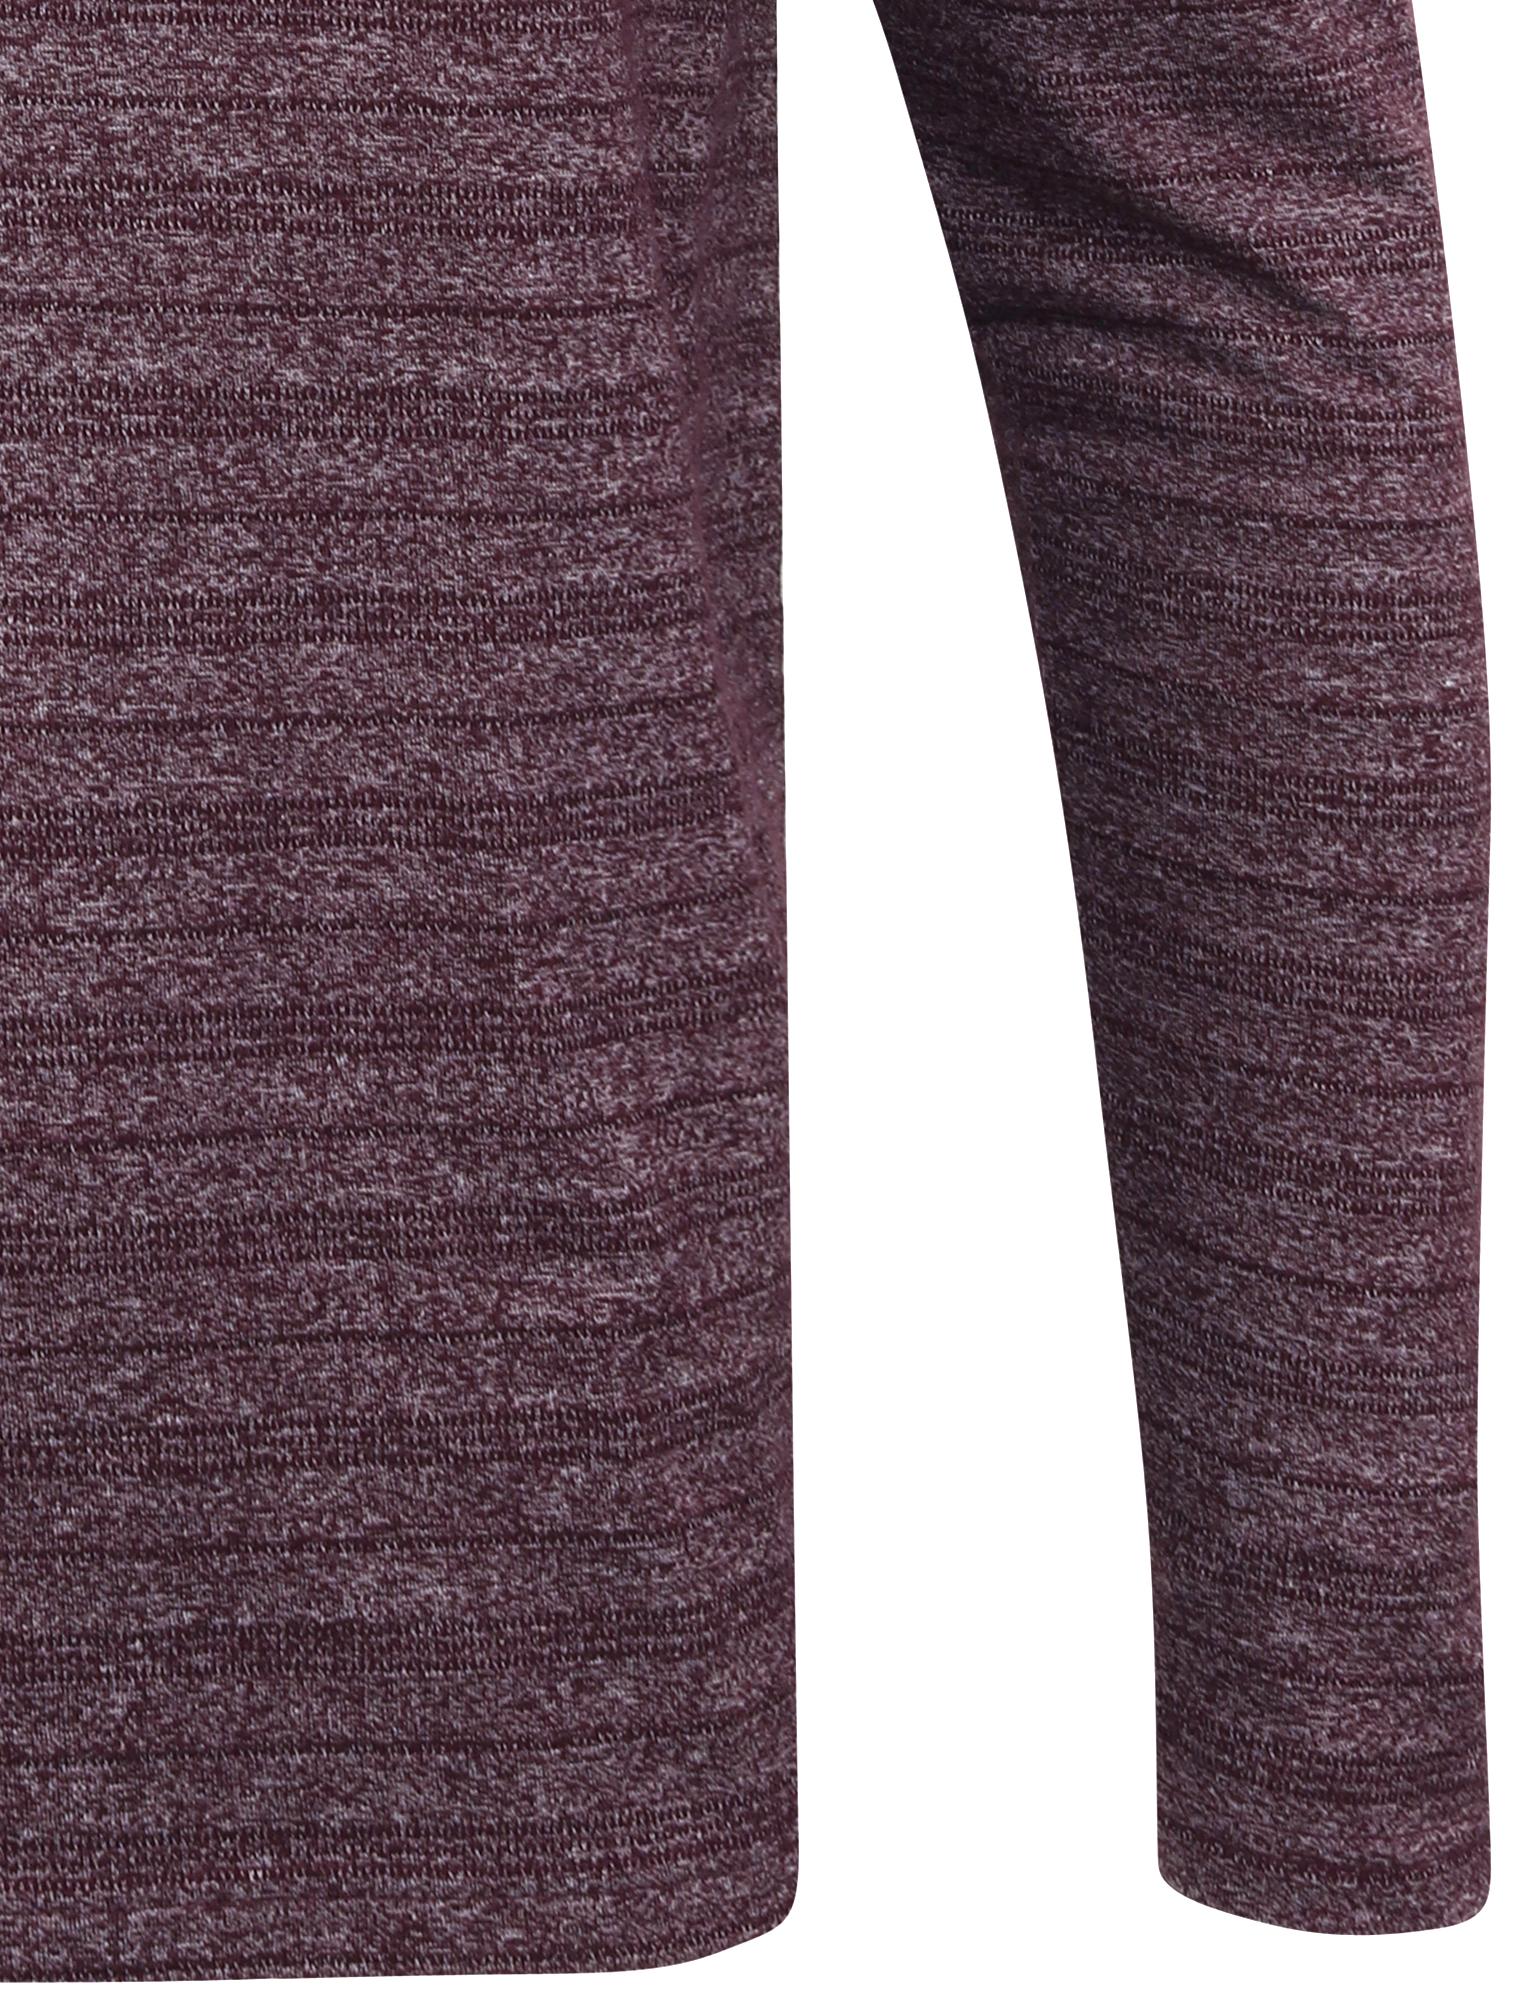 Tokyo-Laundry-Men-Hoaden-Crew-Neck-Long-Sleeve-T-Shirt-Top-Henley-Grandad-Collar thumbnail 10